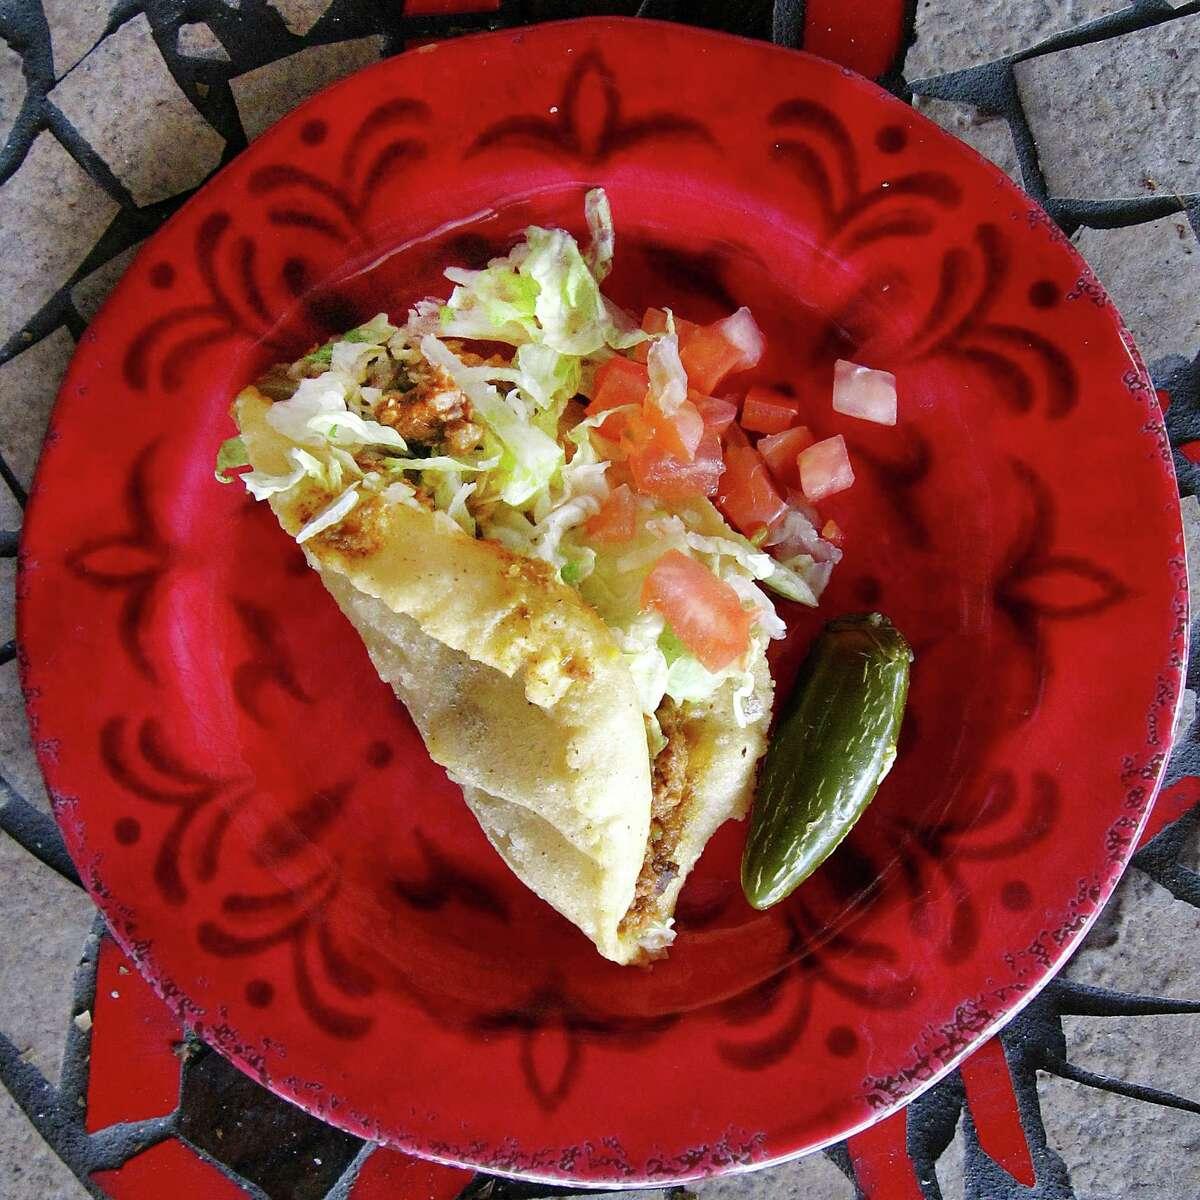 Ray's Drive Inn: Beef picadillo puffy taco. 822 SW 19th St., 210-432-7171, raysdriveinn.net